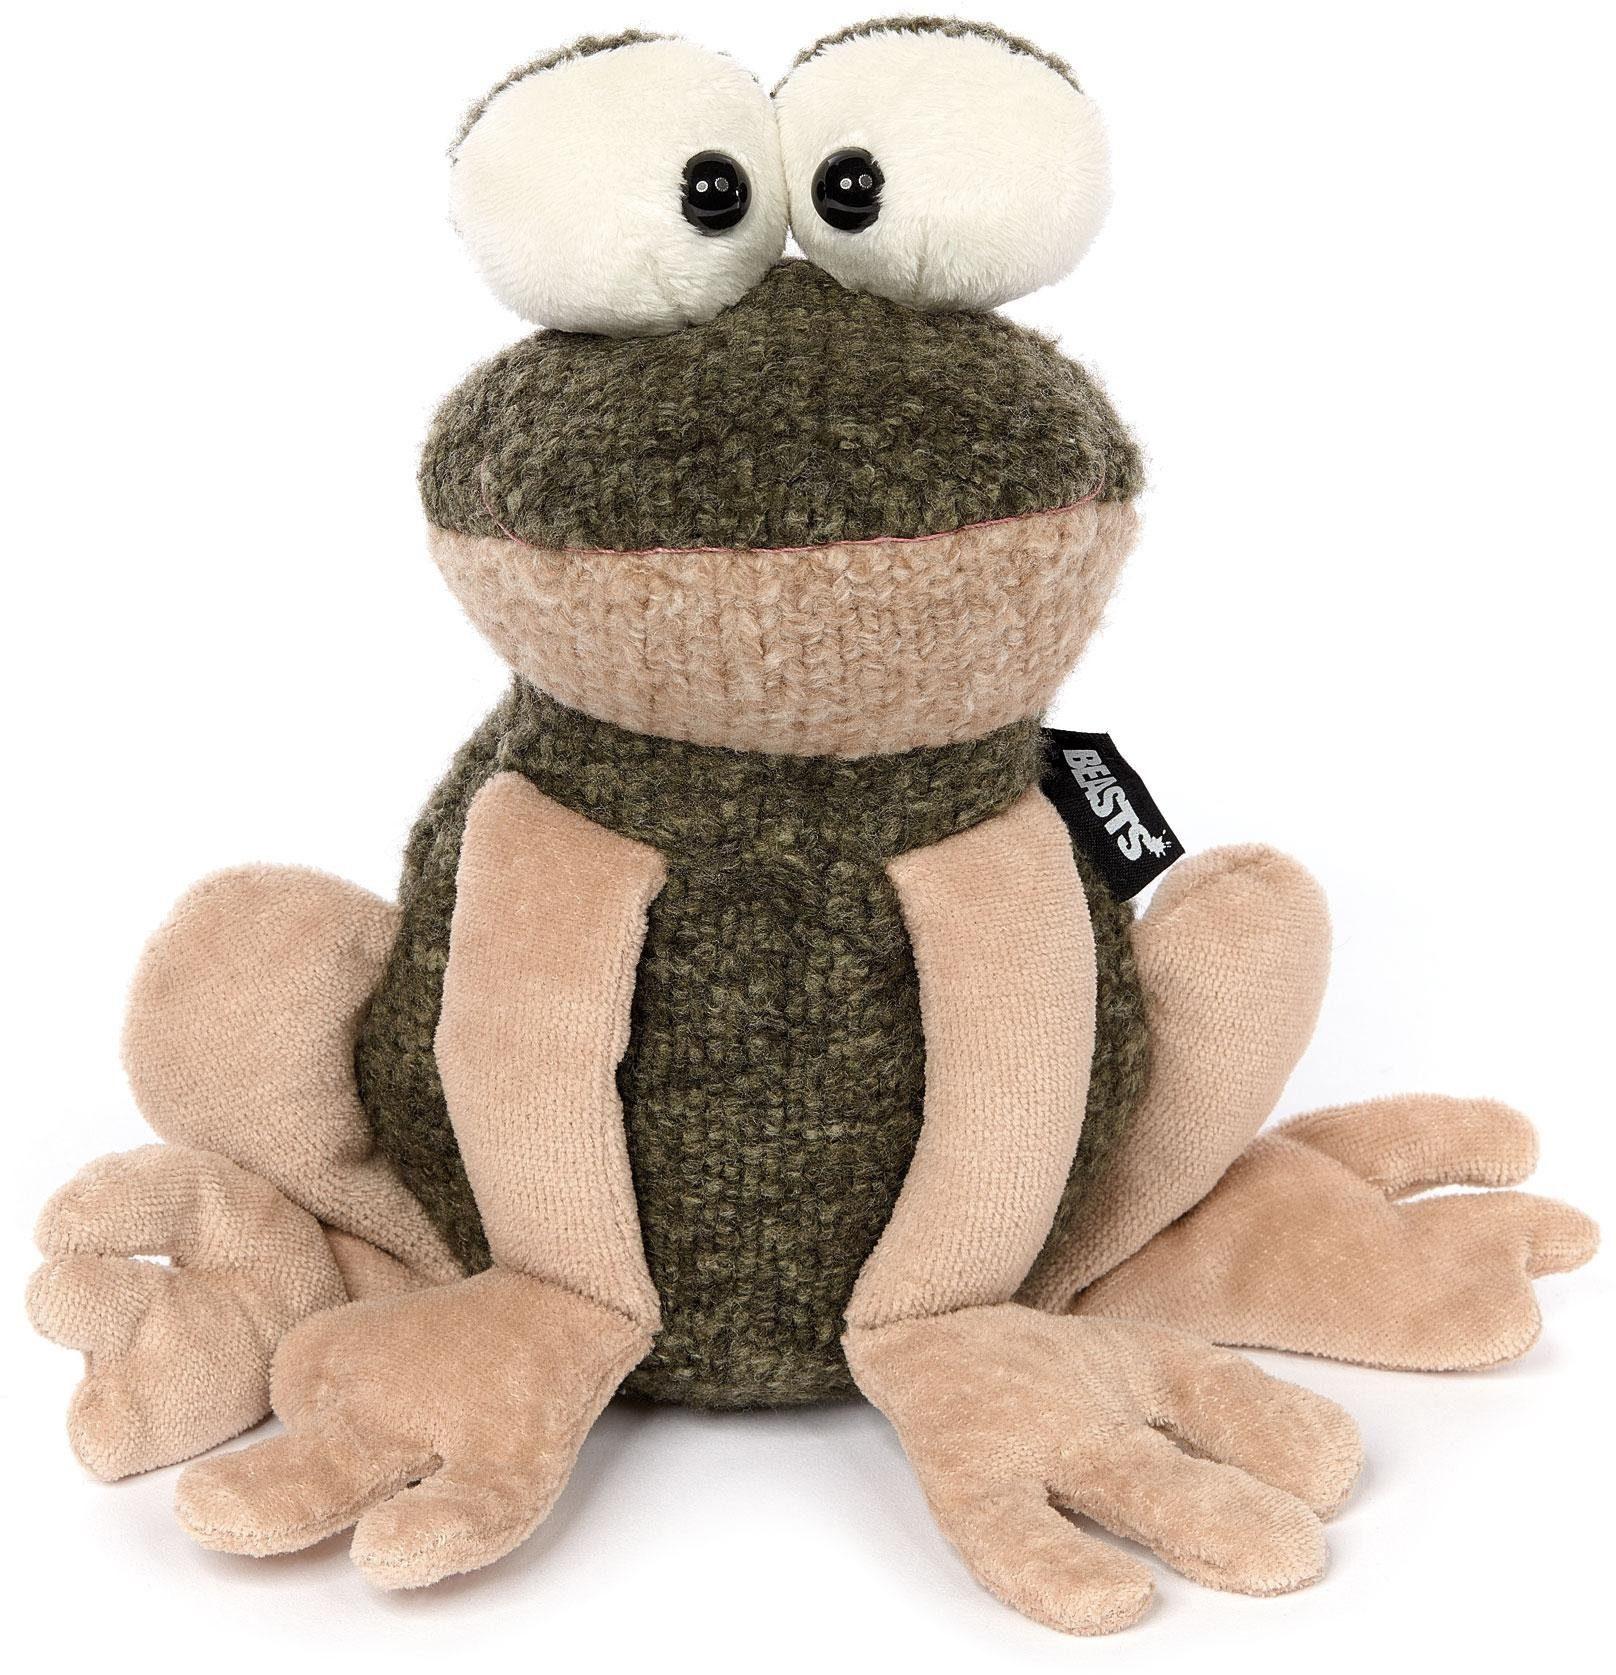 sigikid® Plüschtier, »Beasts - Frosch, I was frog«